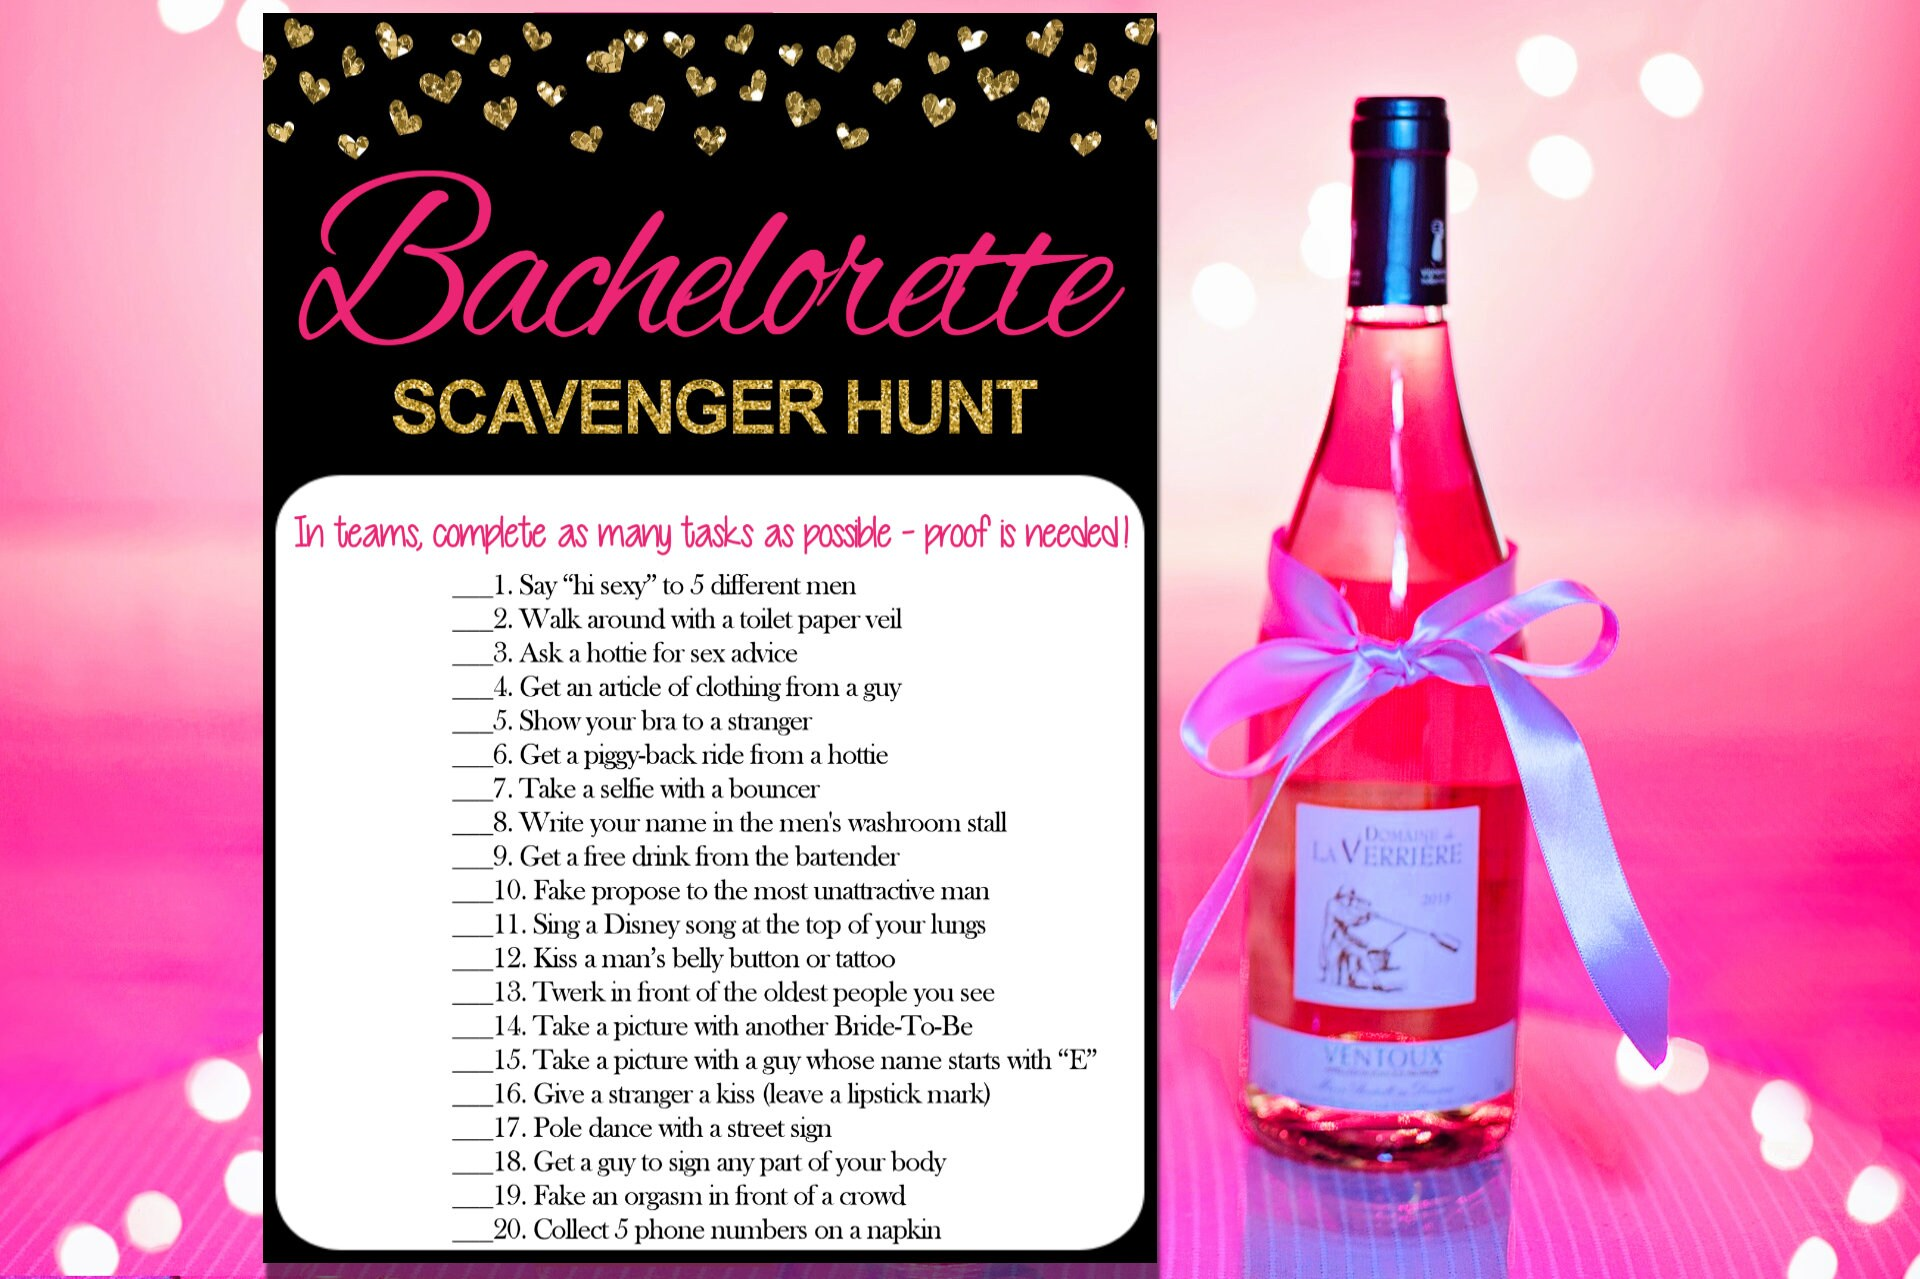 Bachelorette Scavenger Hunt Bachelorette Party Games | Etsy